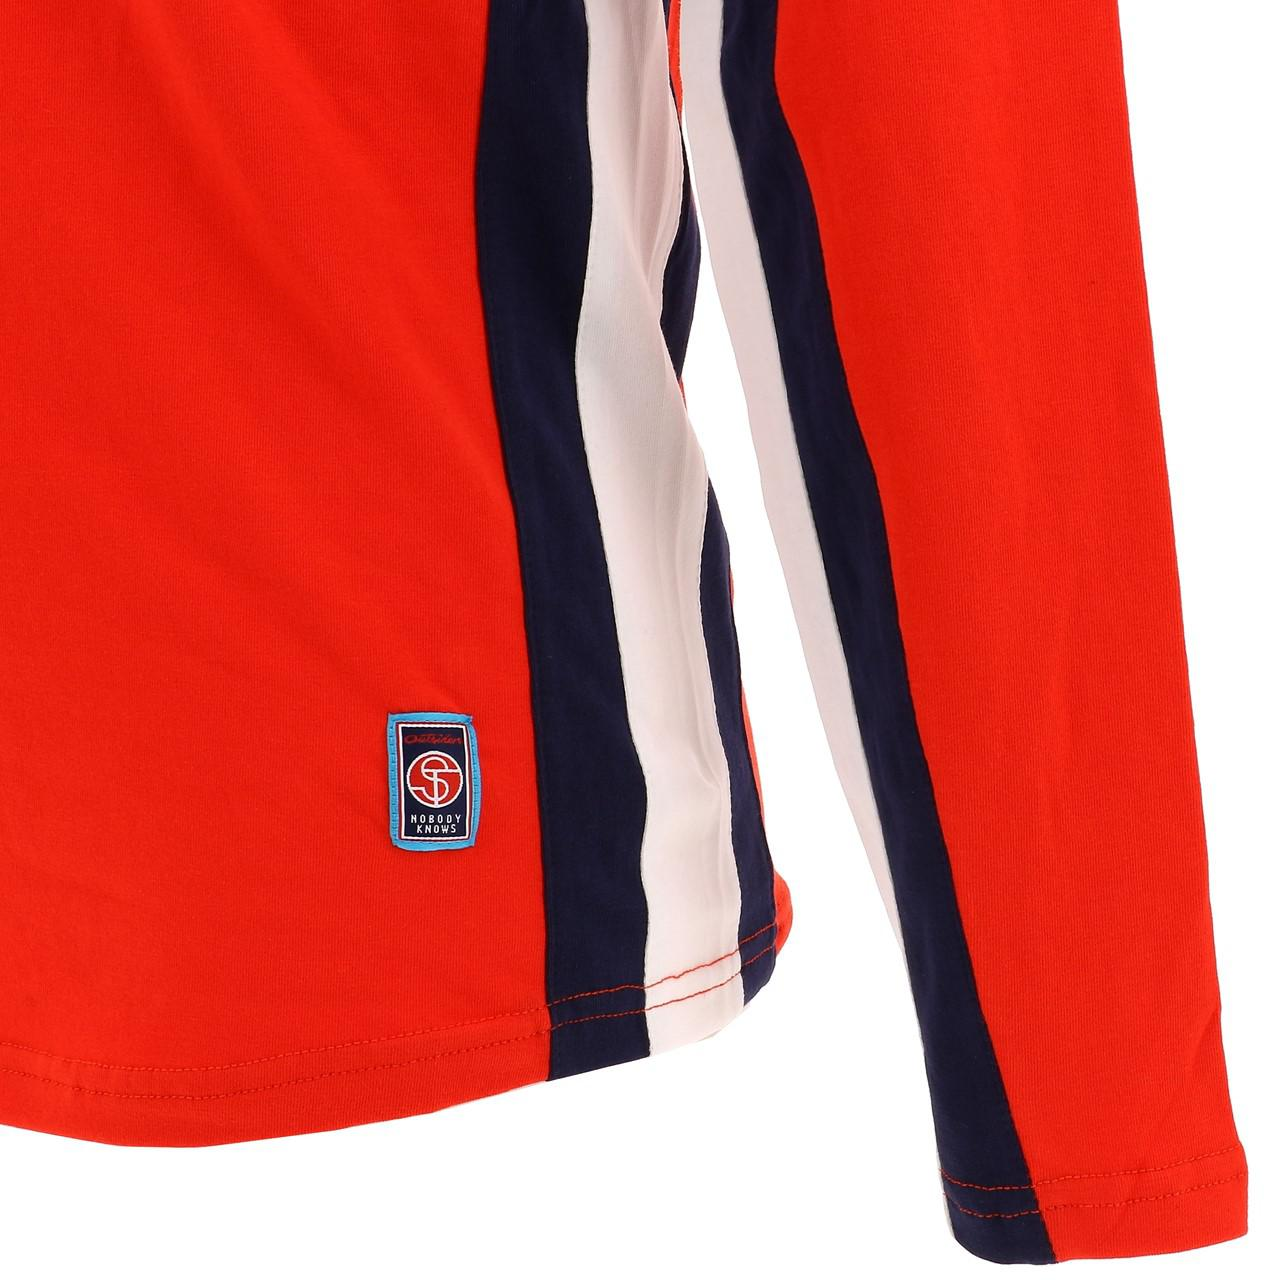 T-Shirt-Long-Sleeves-Yamaha-Yam-C-Red-ML-Tee-Red-28650-New thumbnail 2